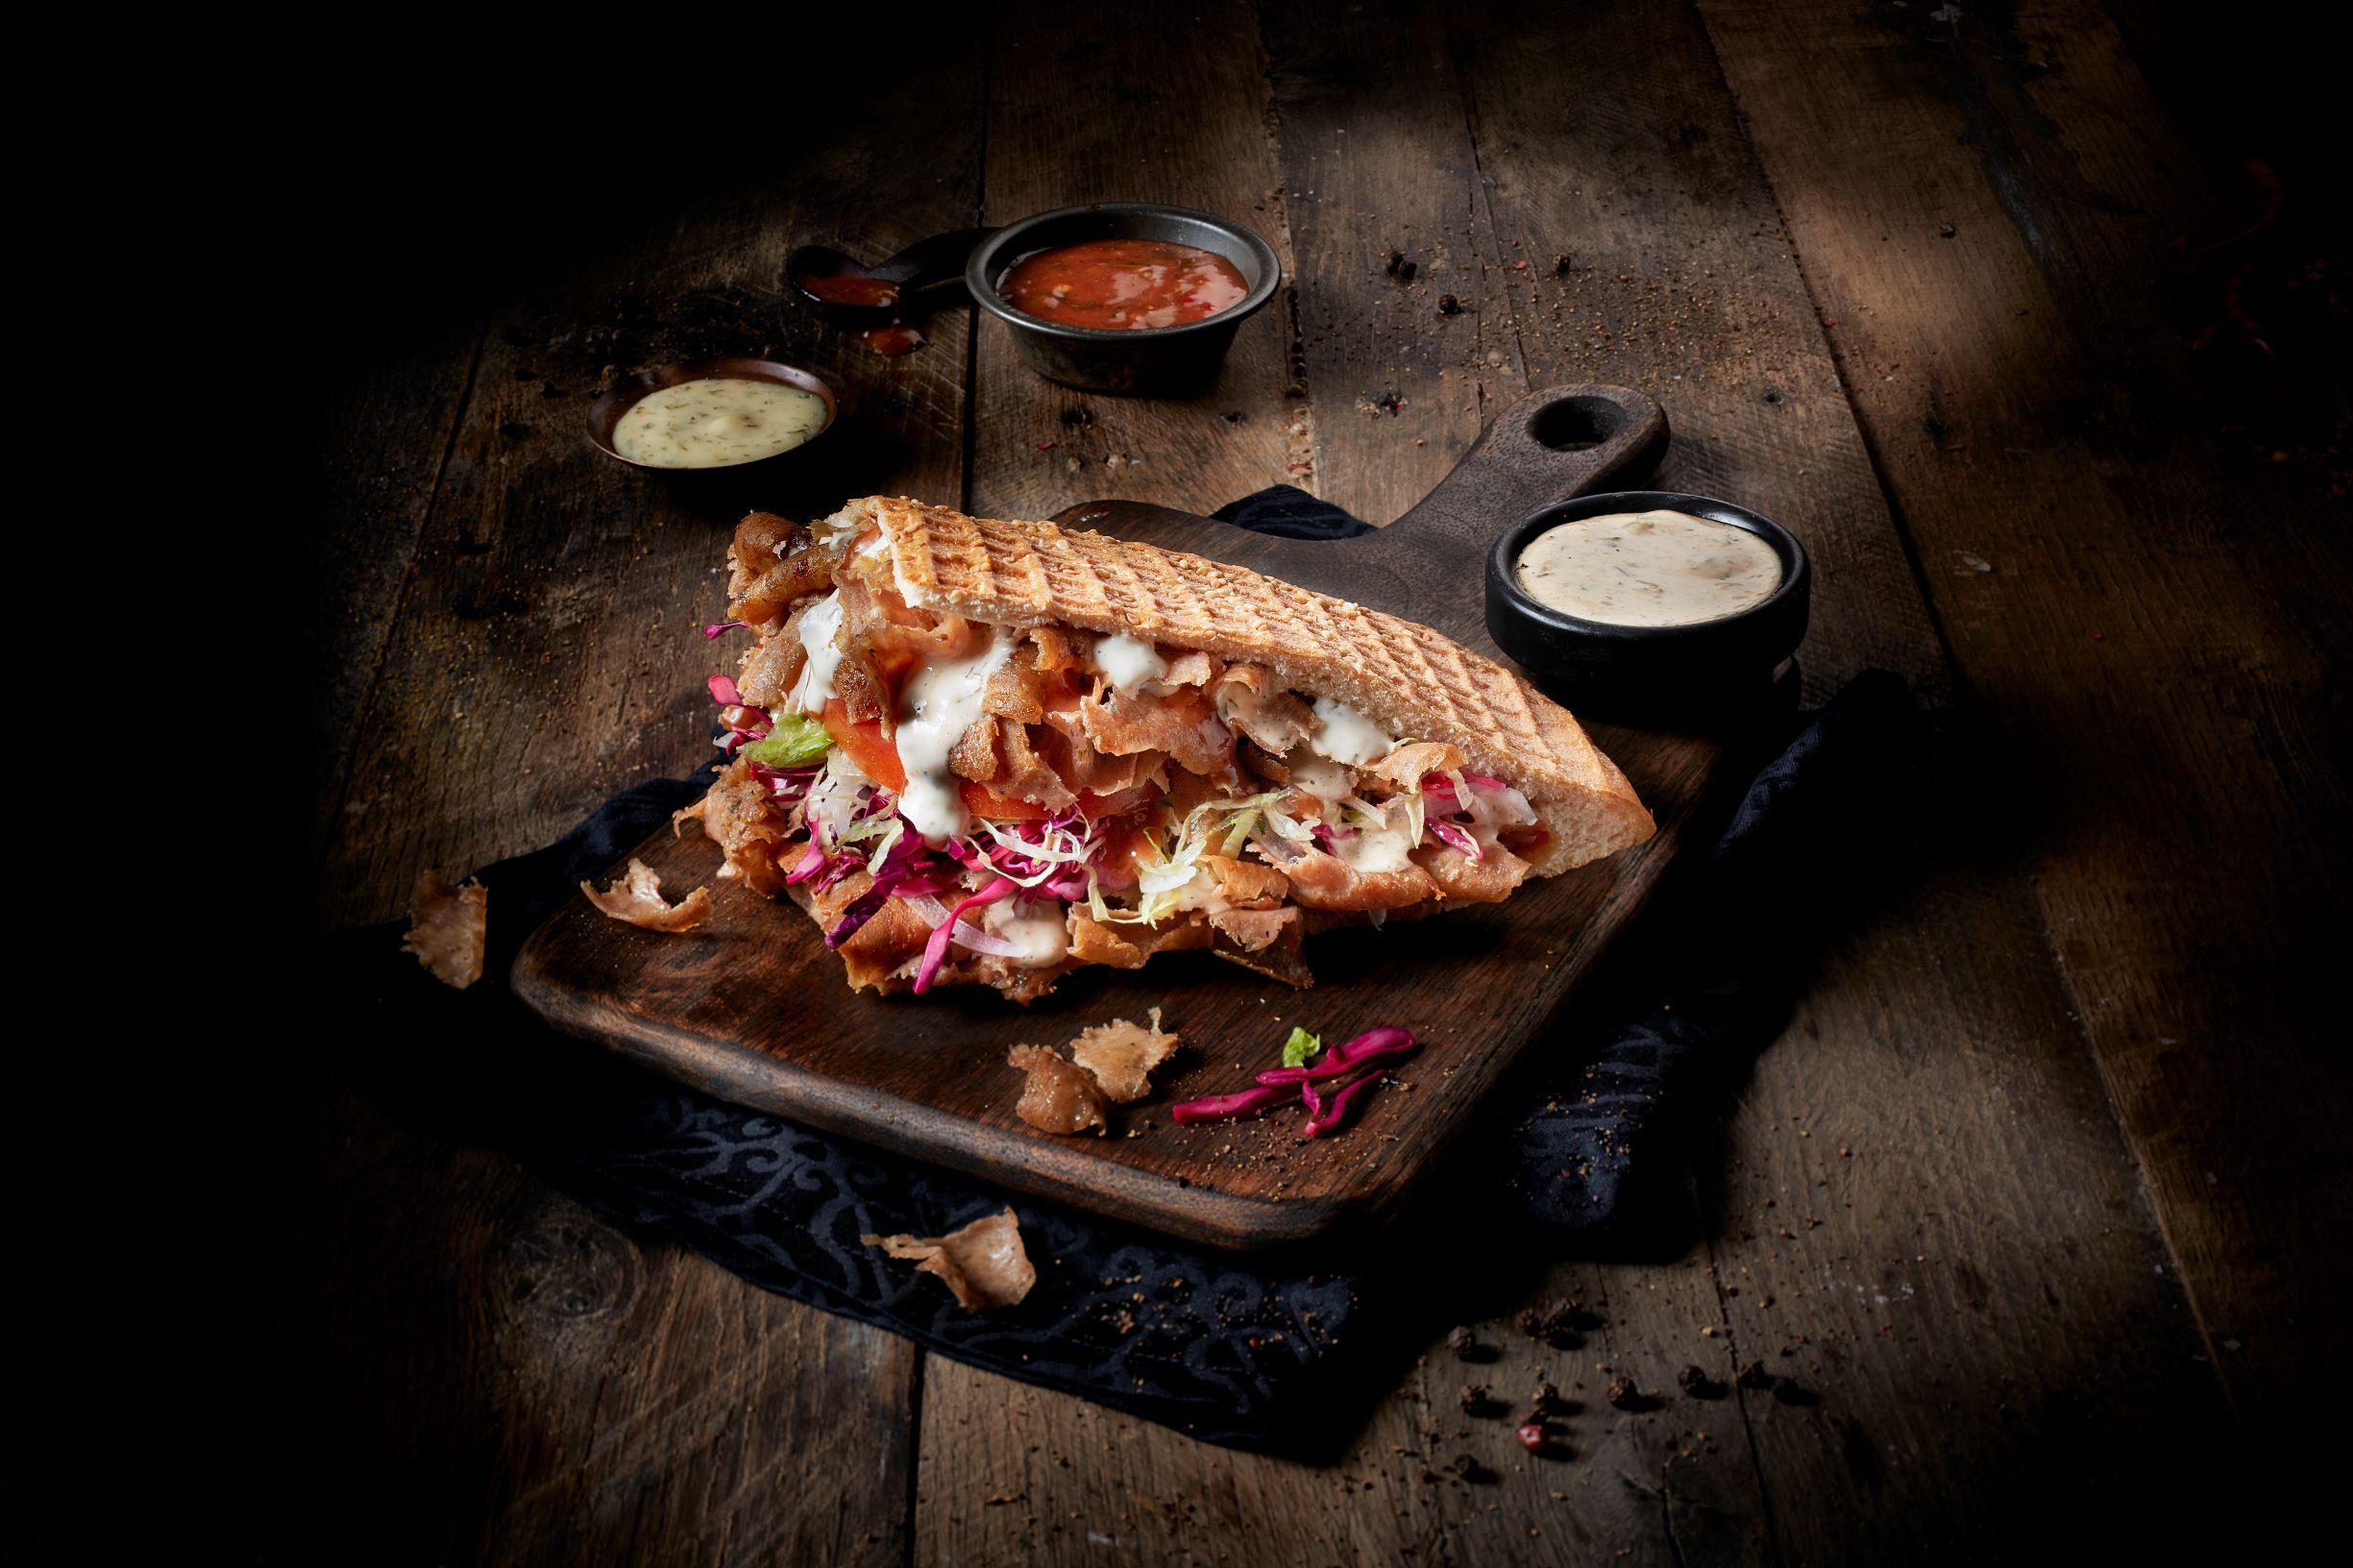 German Doner Kebab opens its doors in Nottingham